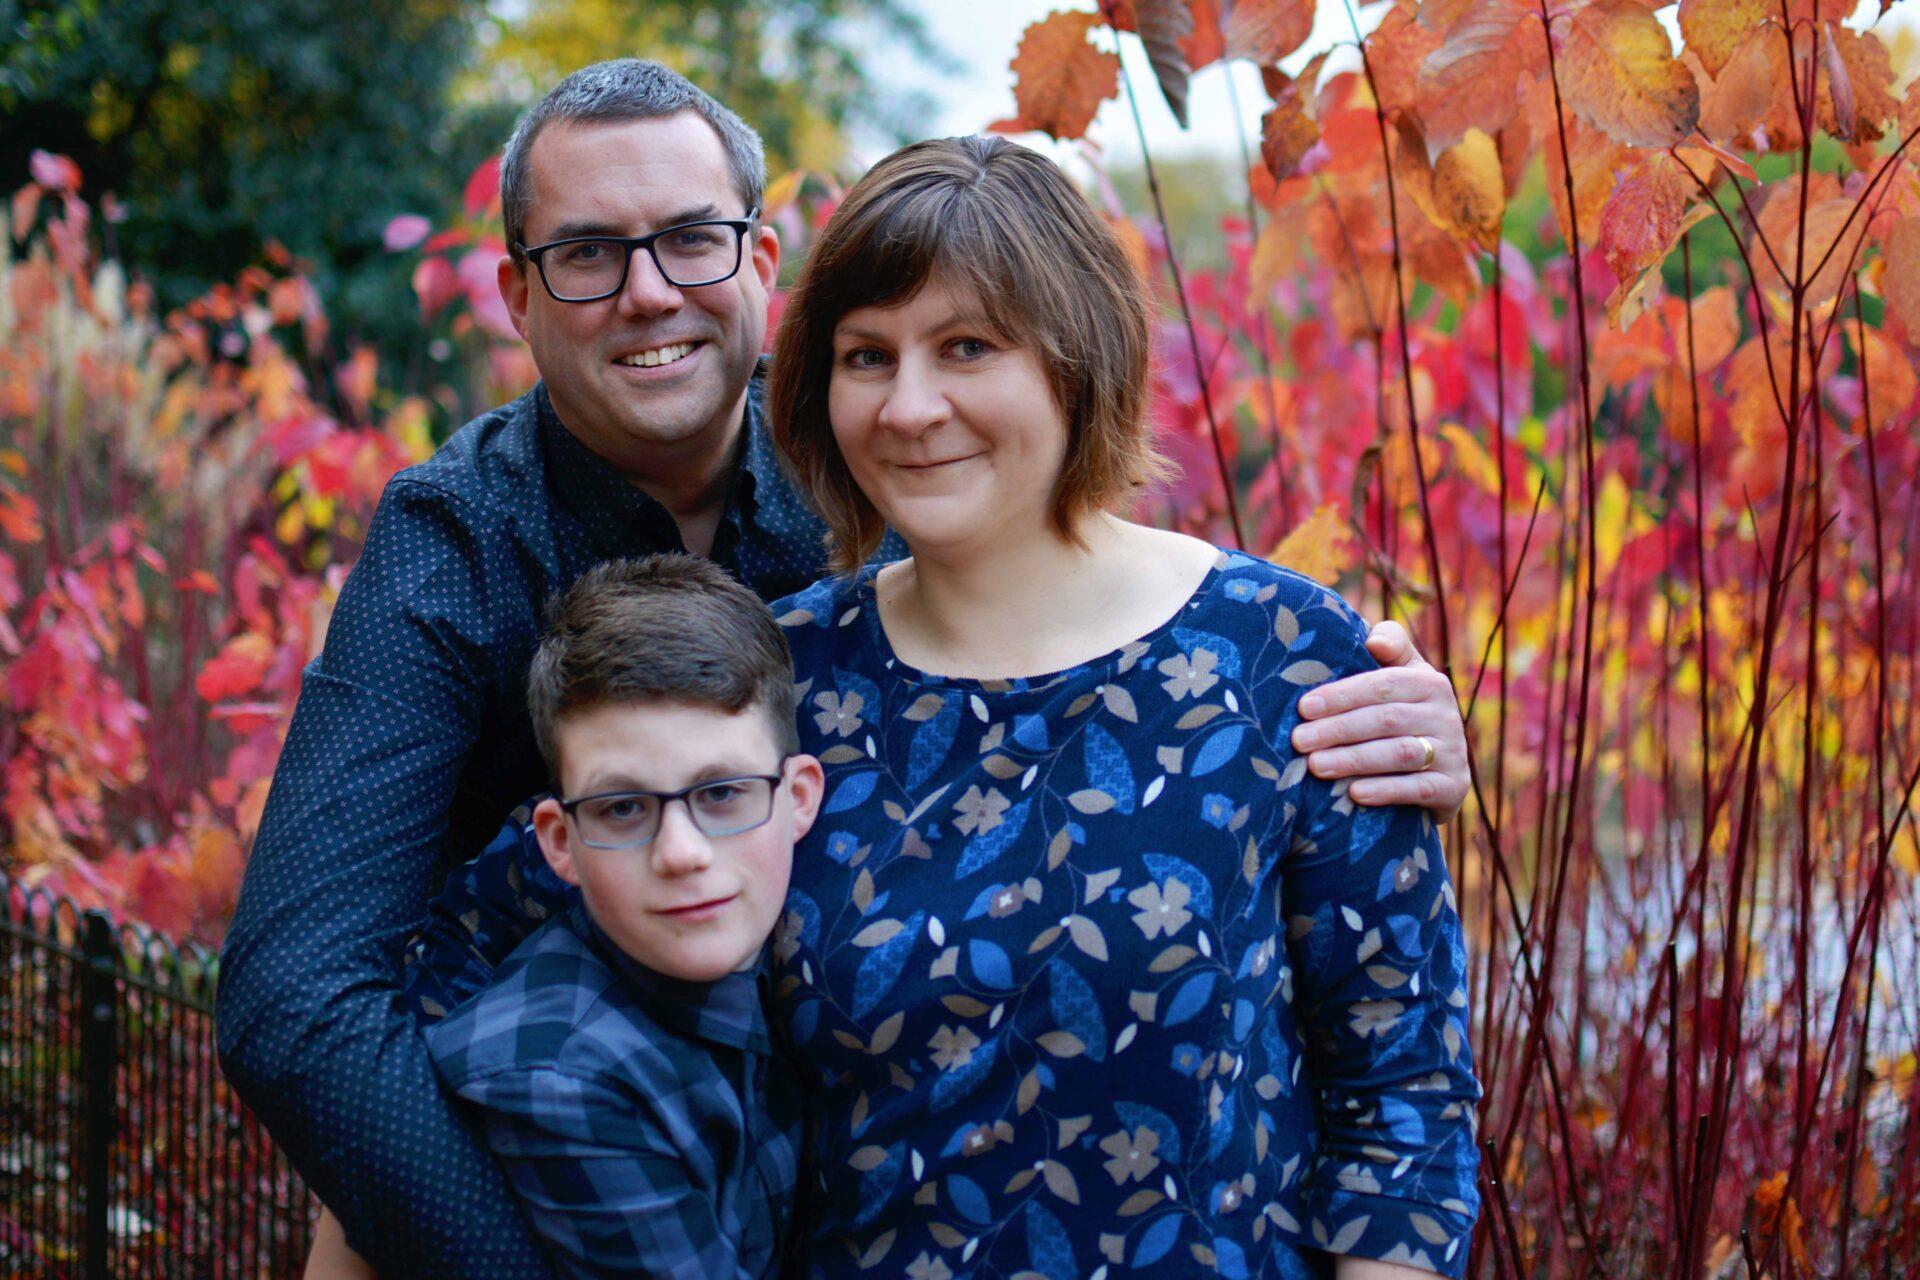 family photography at battersea park london